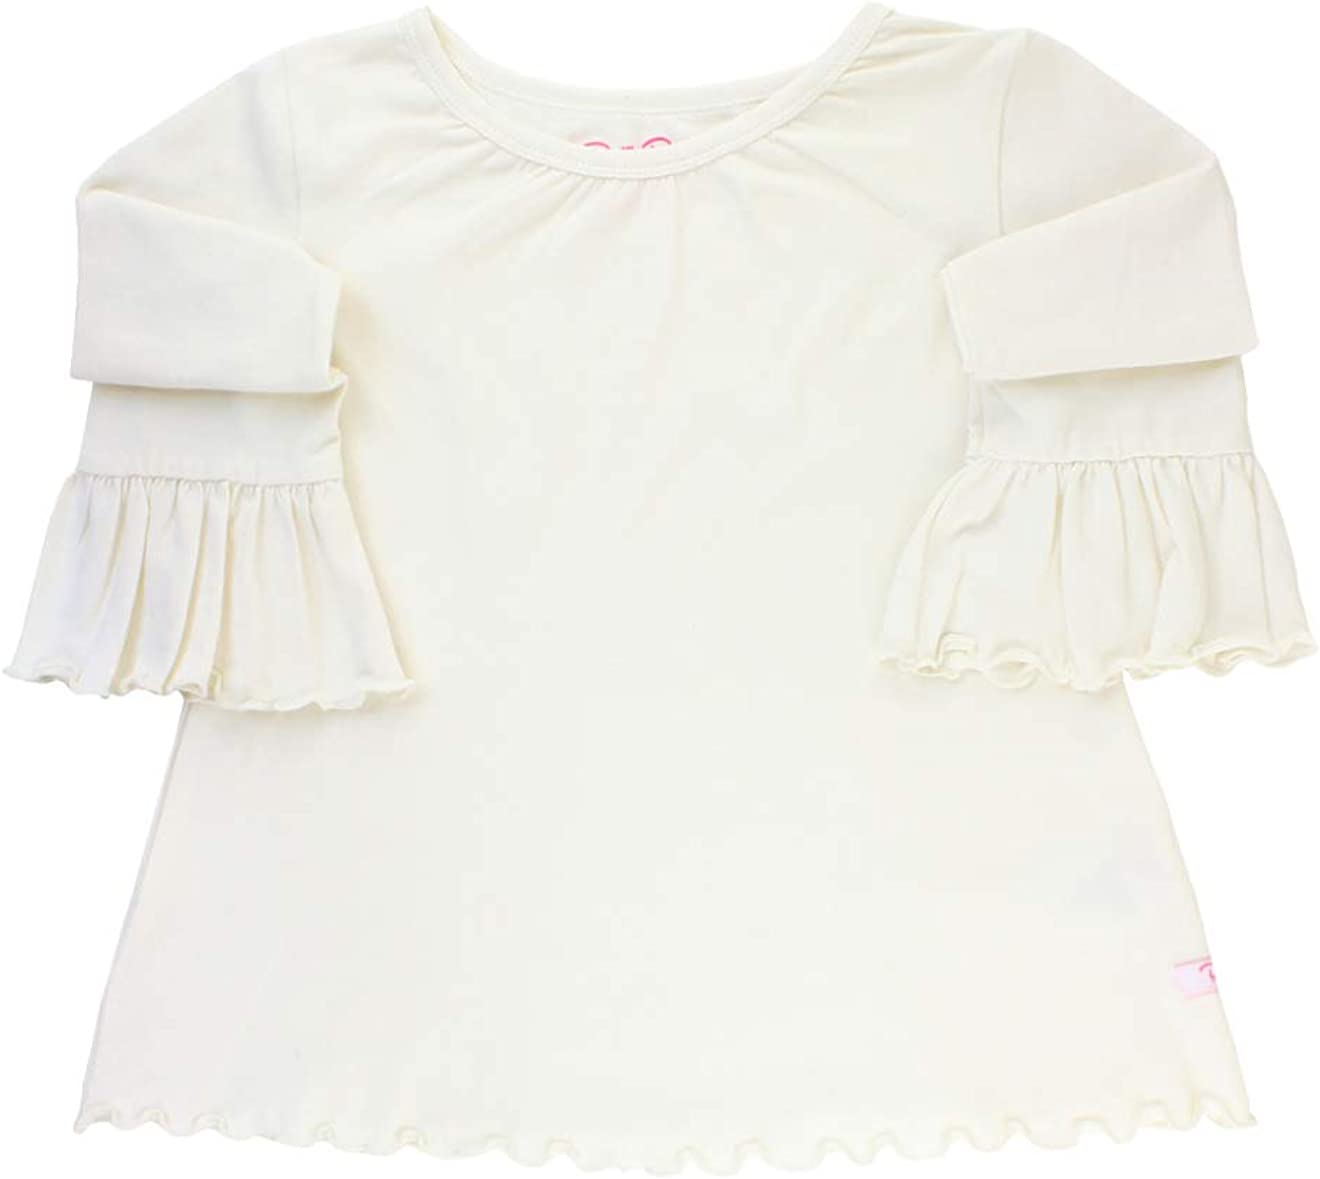 RuffleButts Baby/Toddler Girls Ruffled Knit Top w/Bell Sleeve